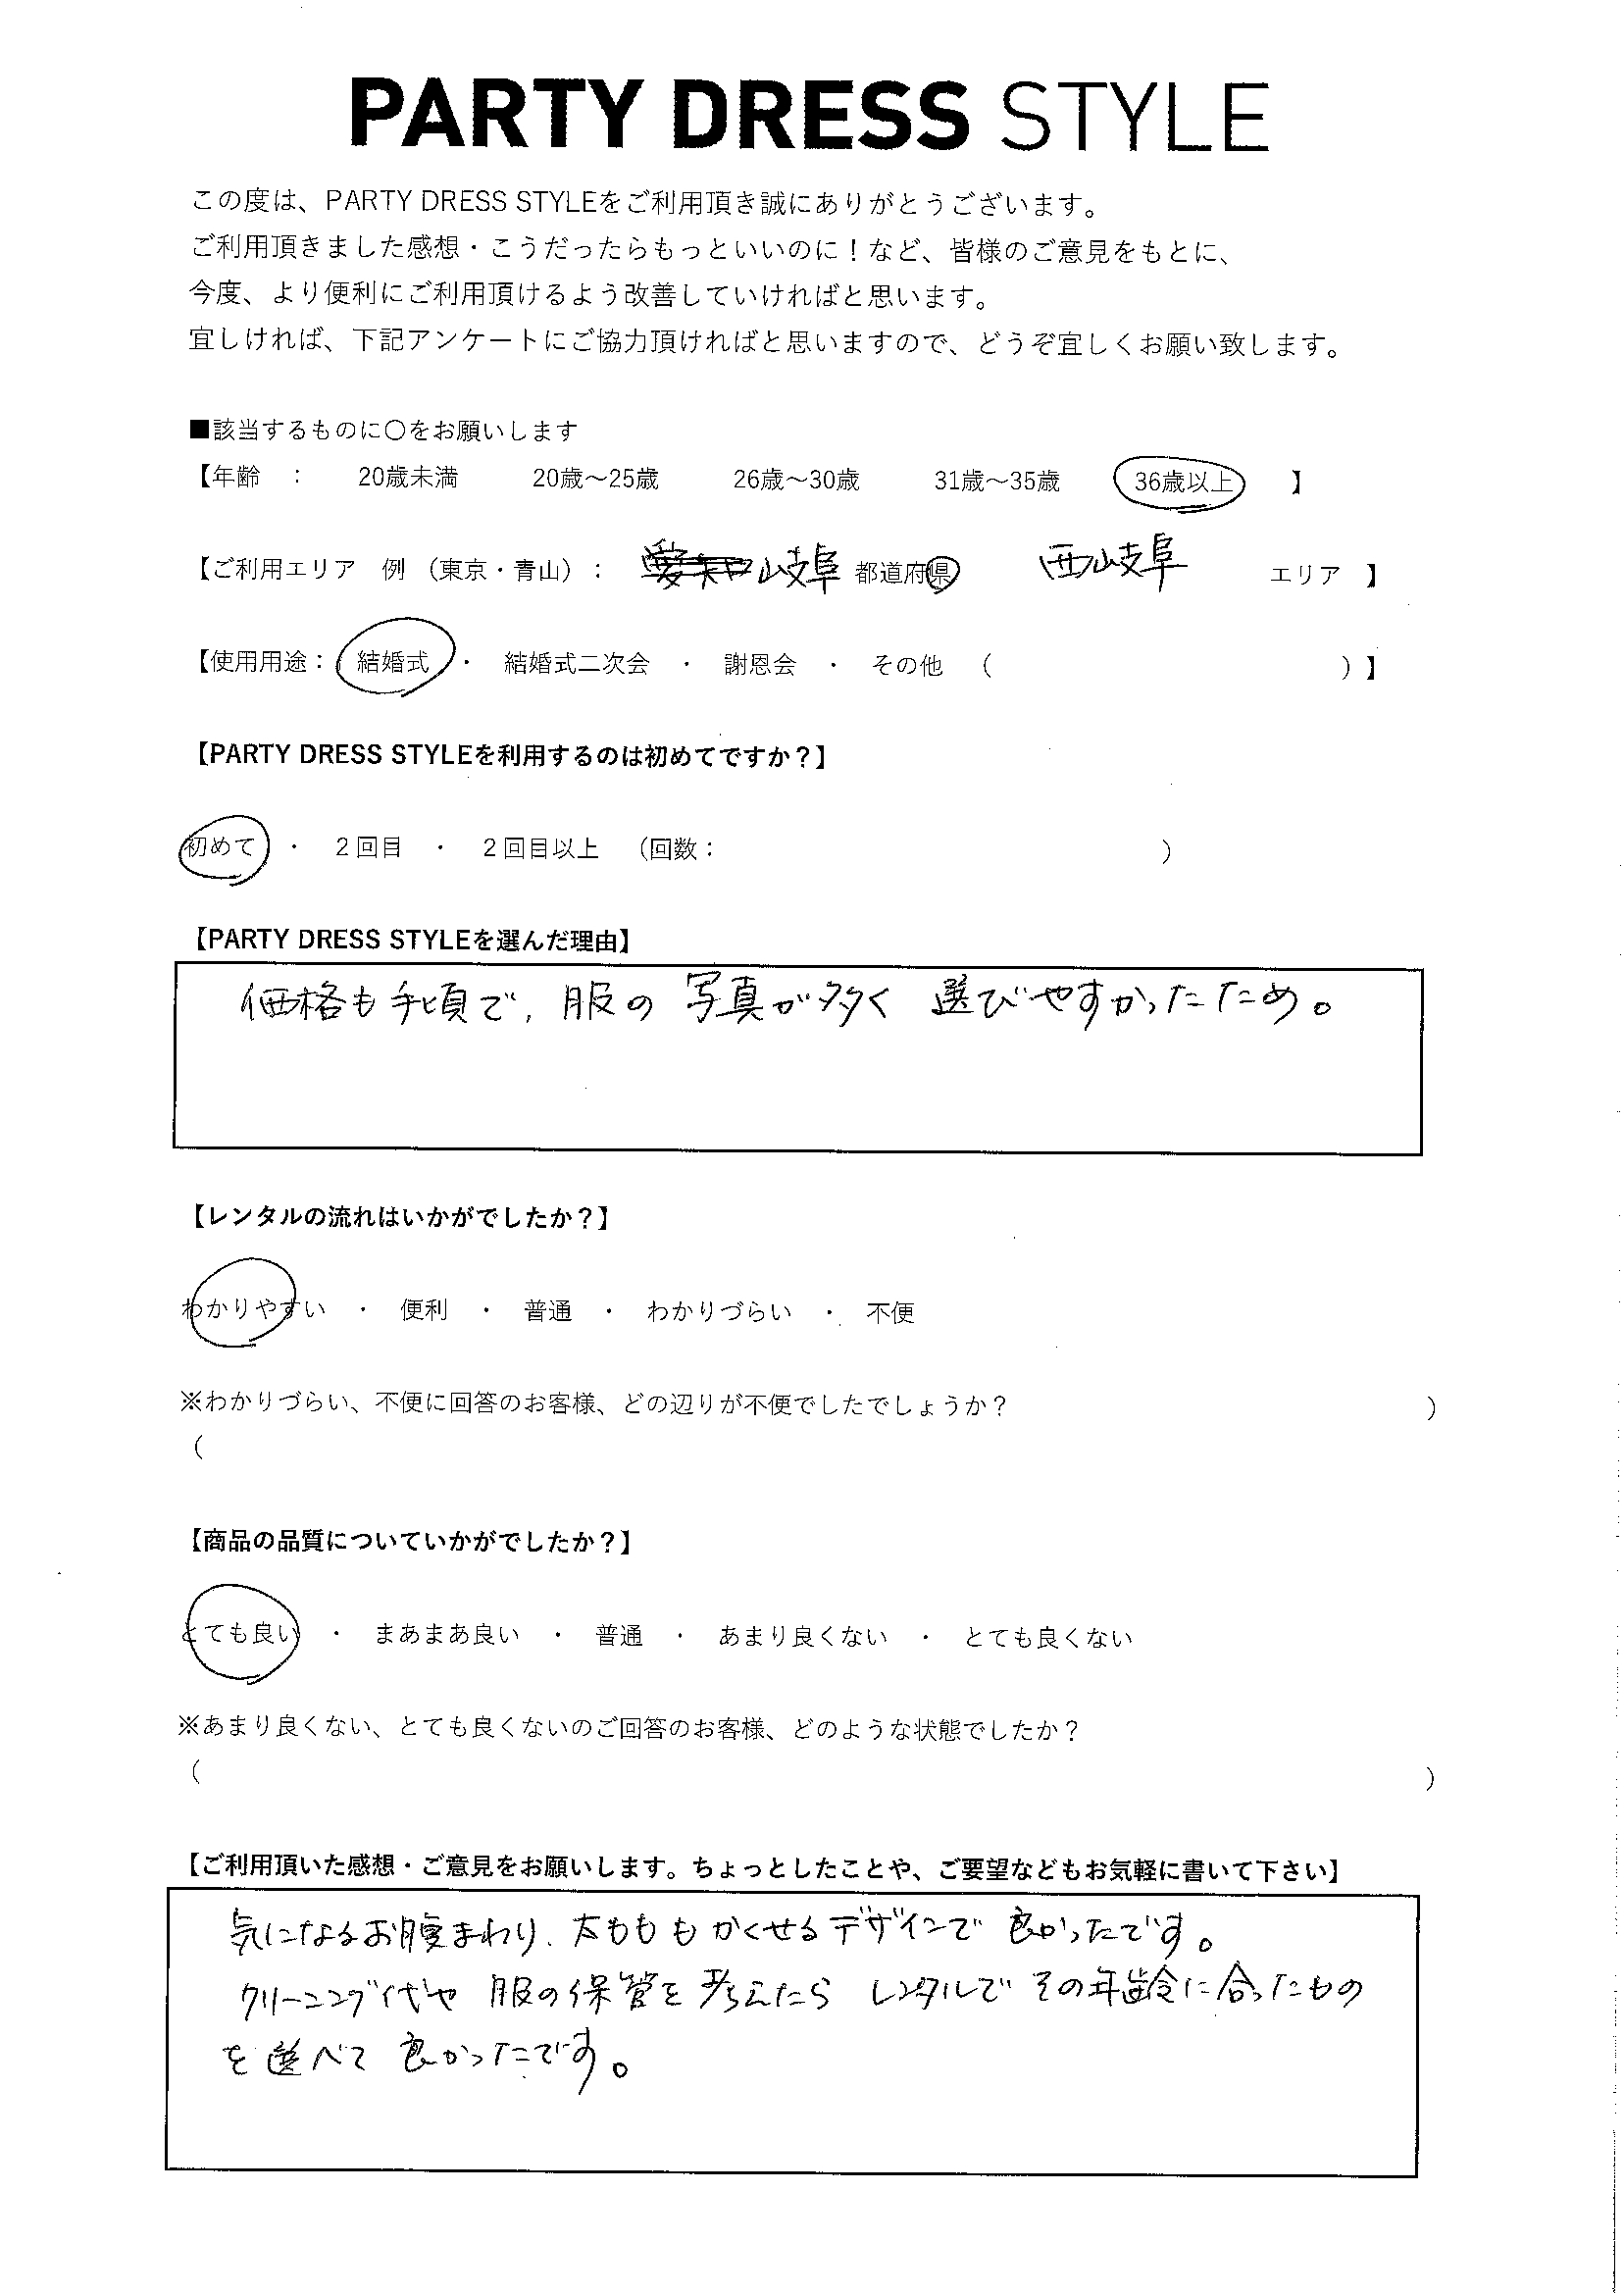 9/28結婚式 岐阜県・西岐阜エリア